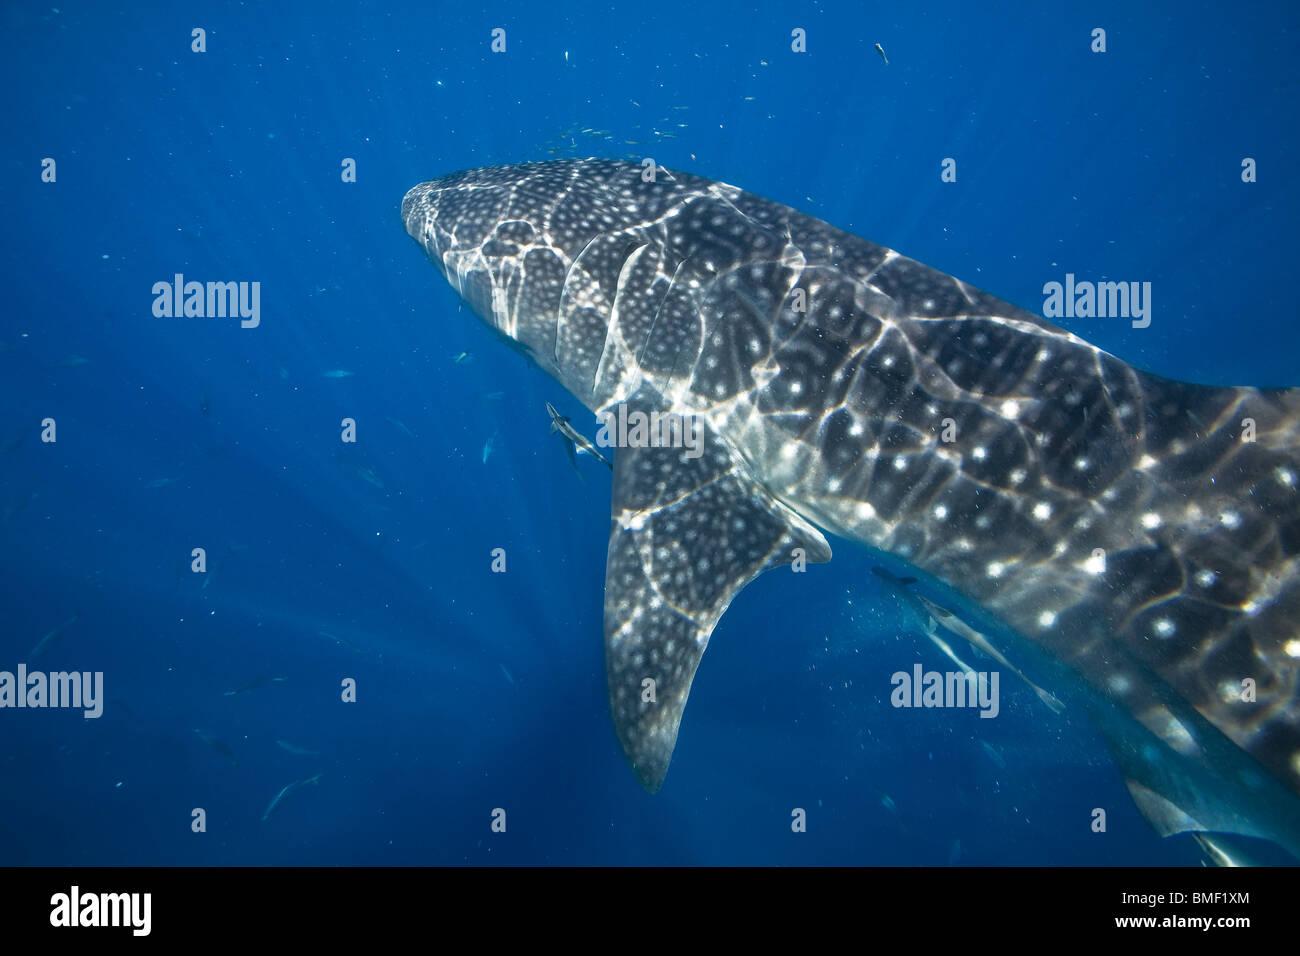 Tiburón ballena, Bahía Honda, Palawan, Filipinas Imagen De Stock